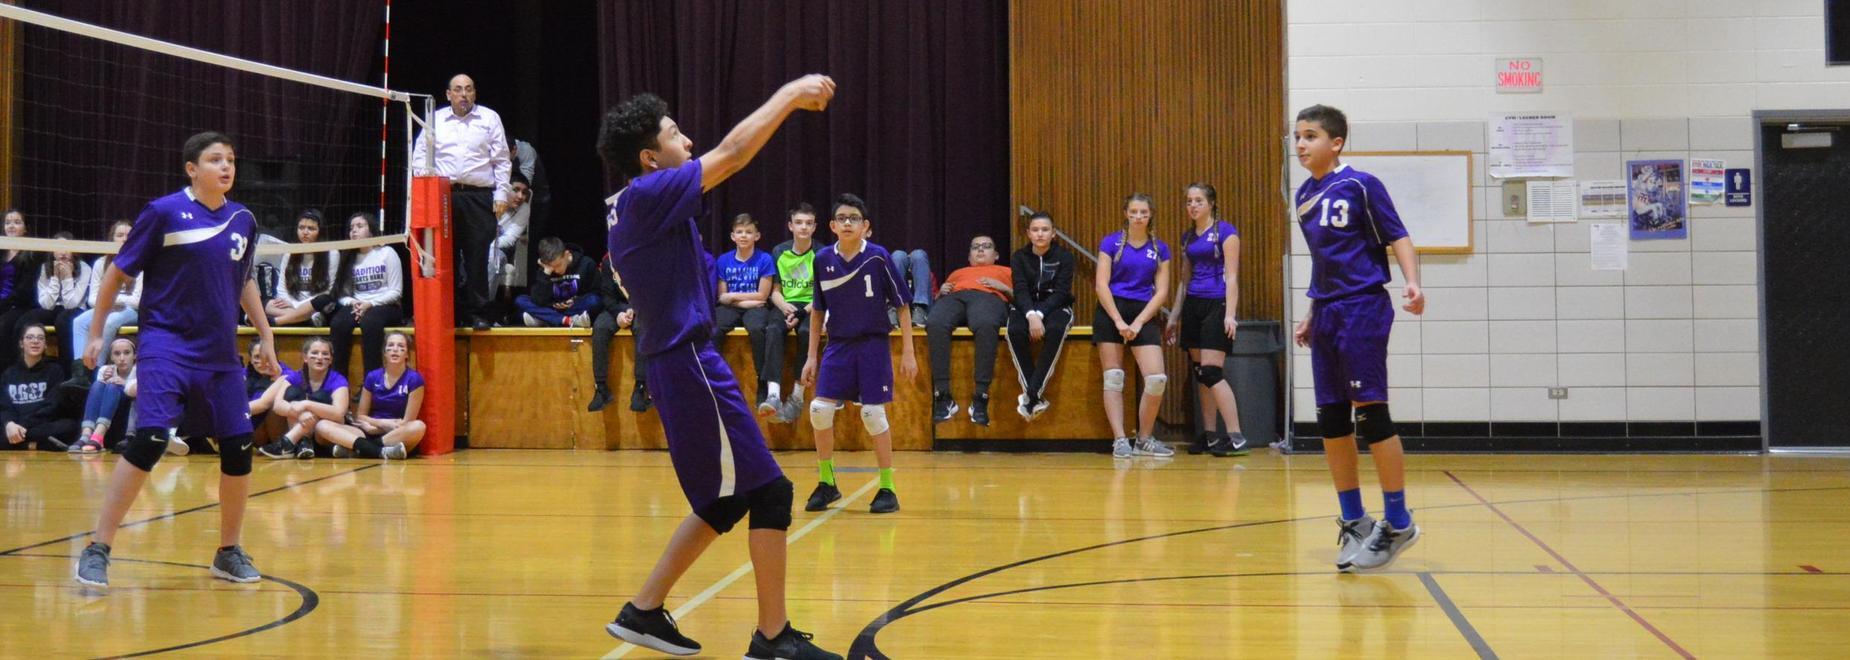 Boys vs. Faculty Volleyball